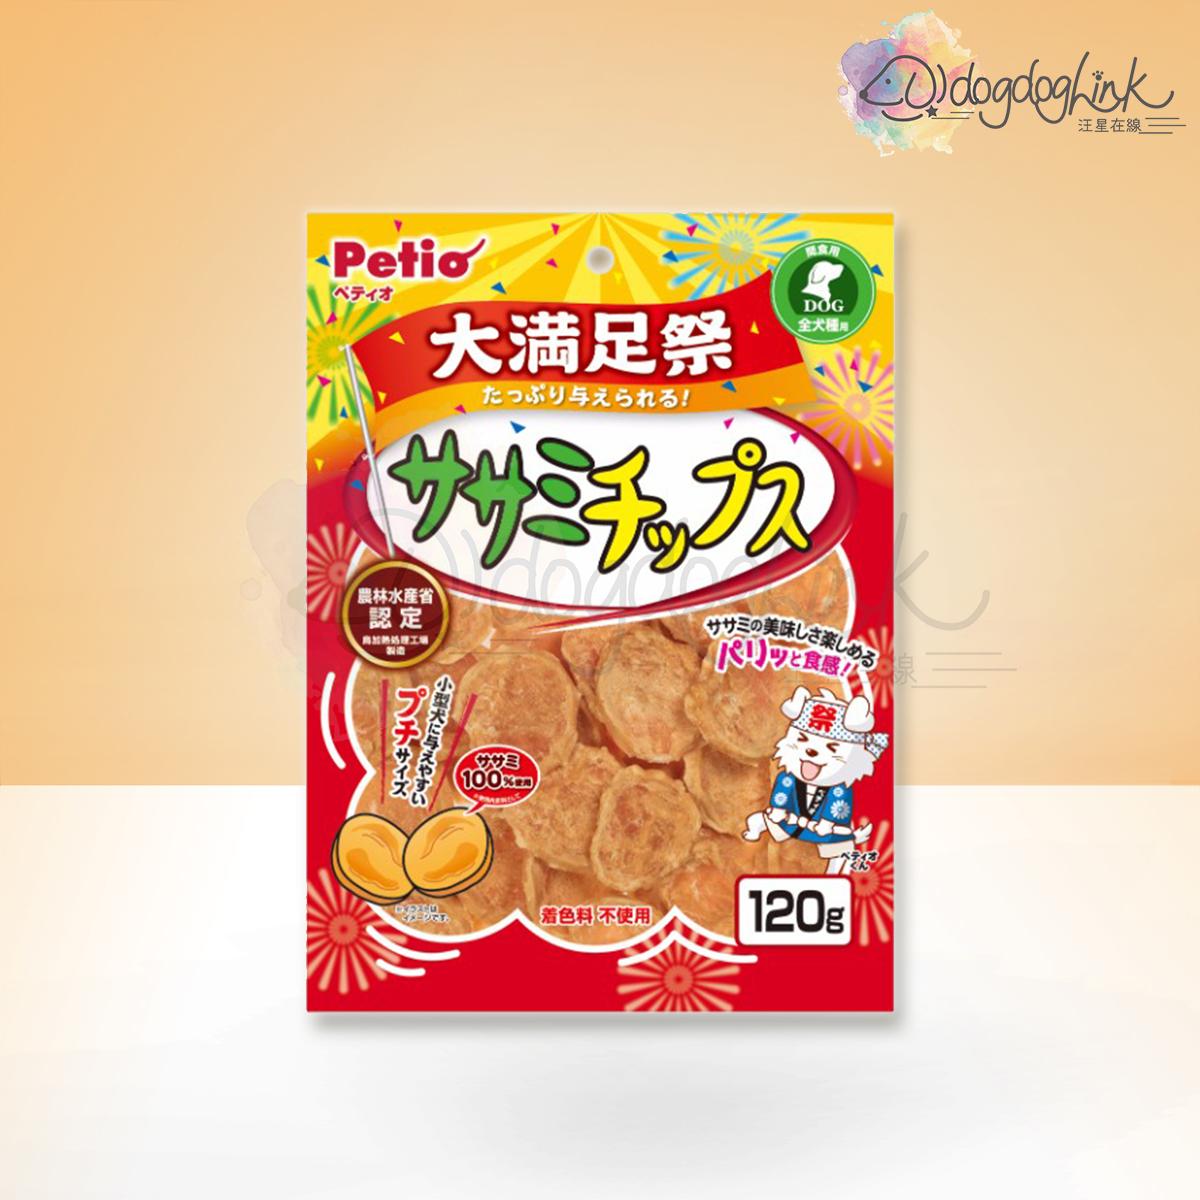 Bonus Pack Chicken Breast Chips 120g